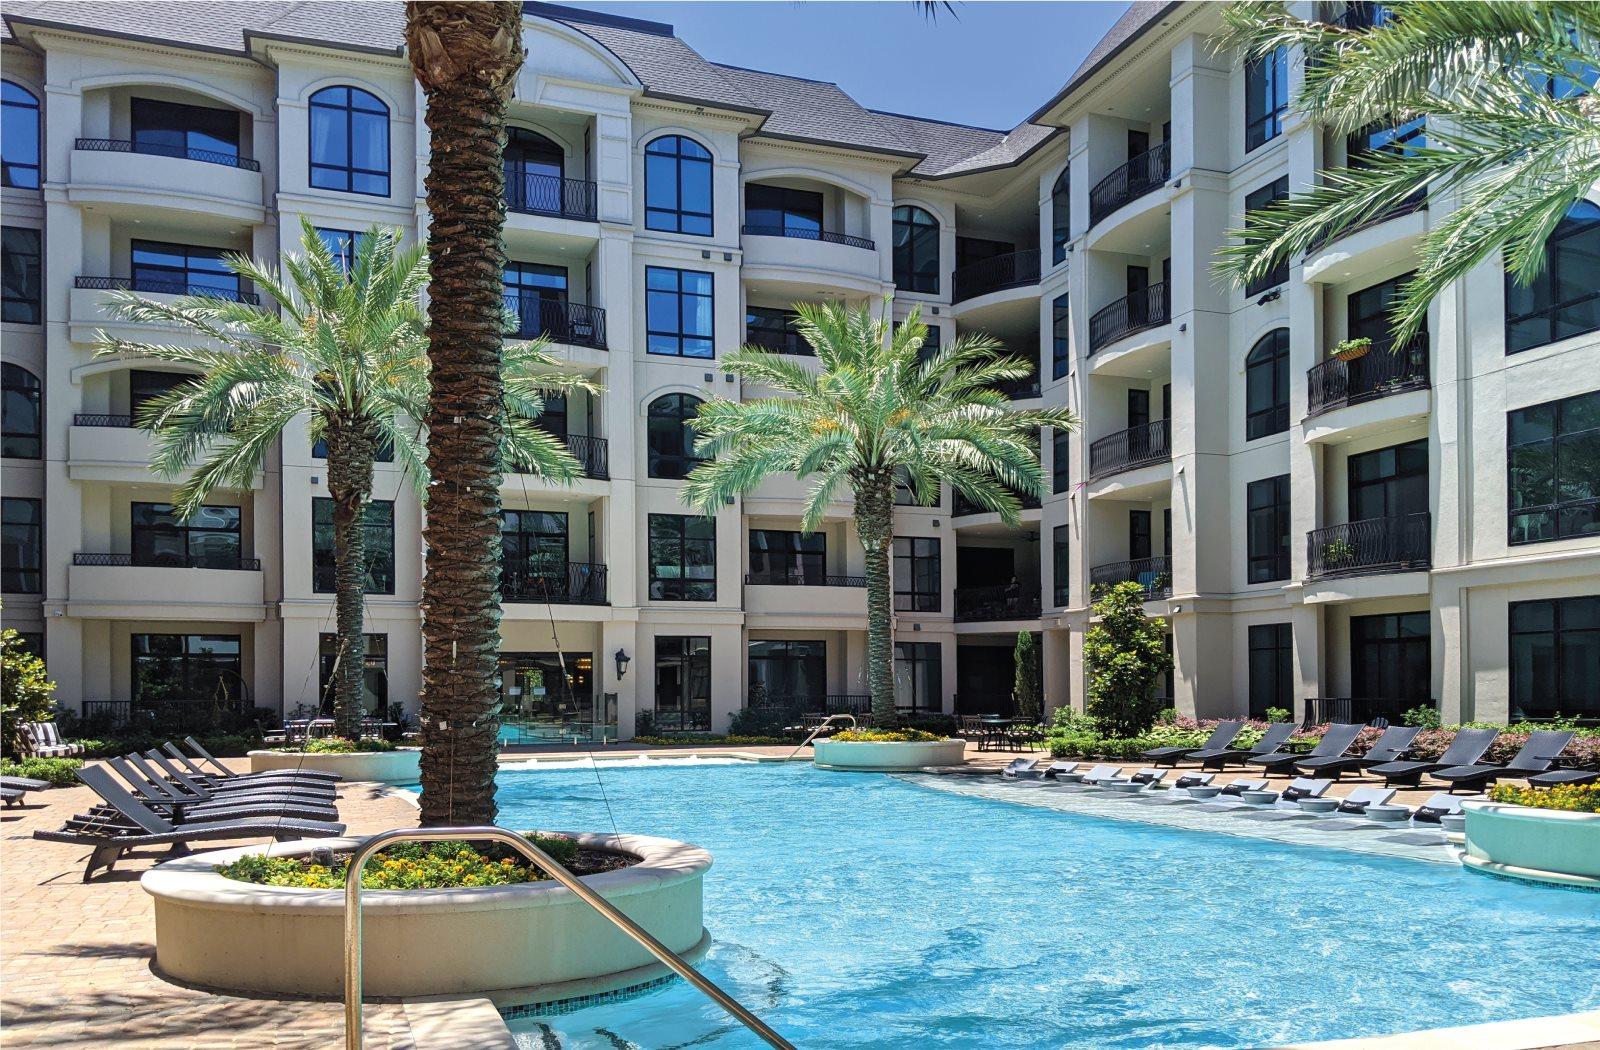 Pool - Le Palais Apartments